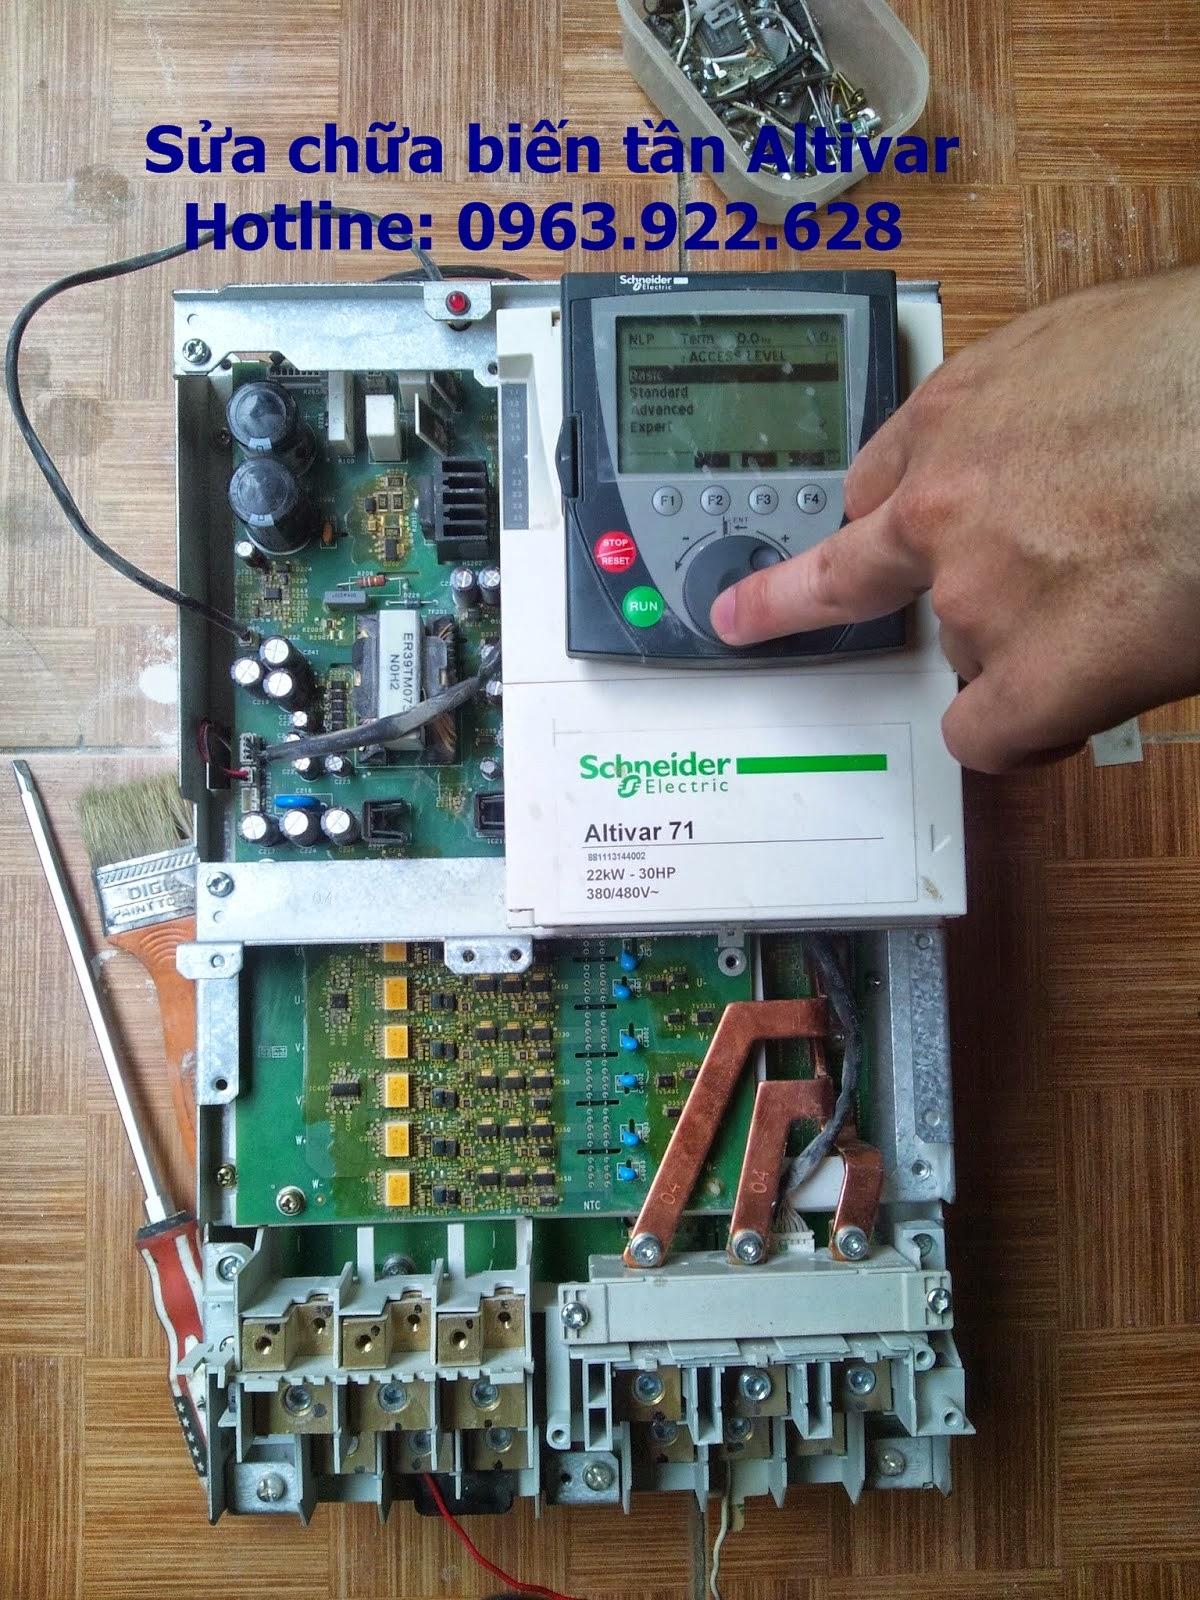 Chuyên sửa chữa biến tần Altivar ATV71, Altivar ATV61, Altivar ATV21